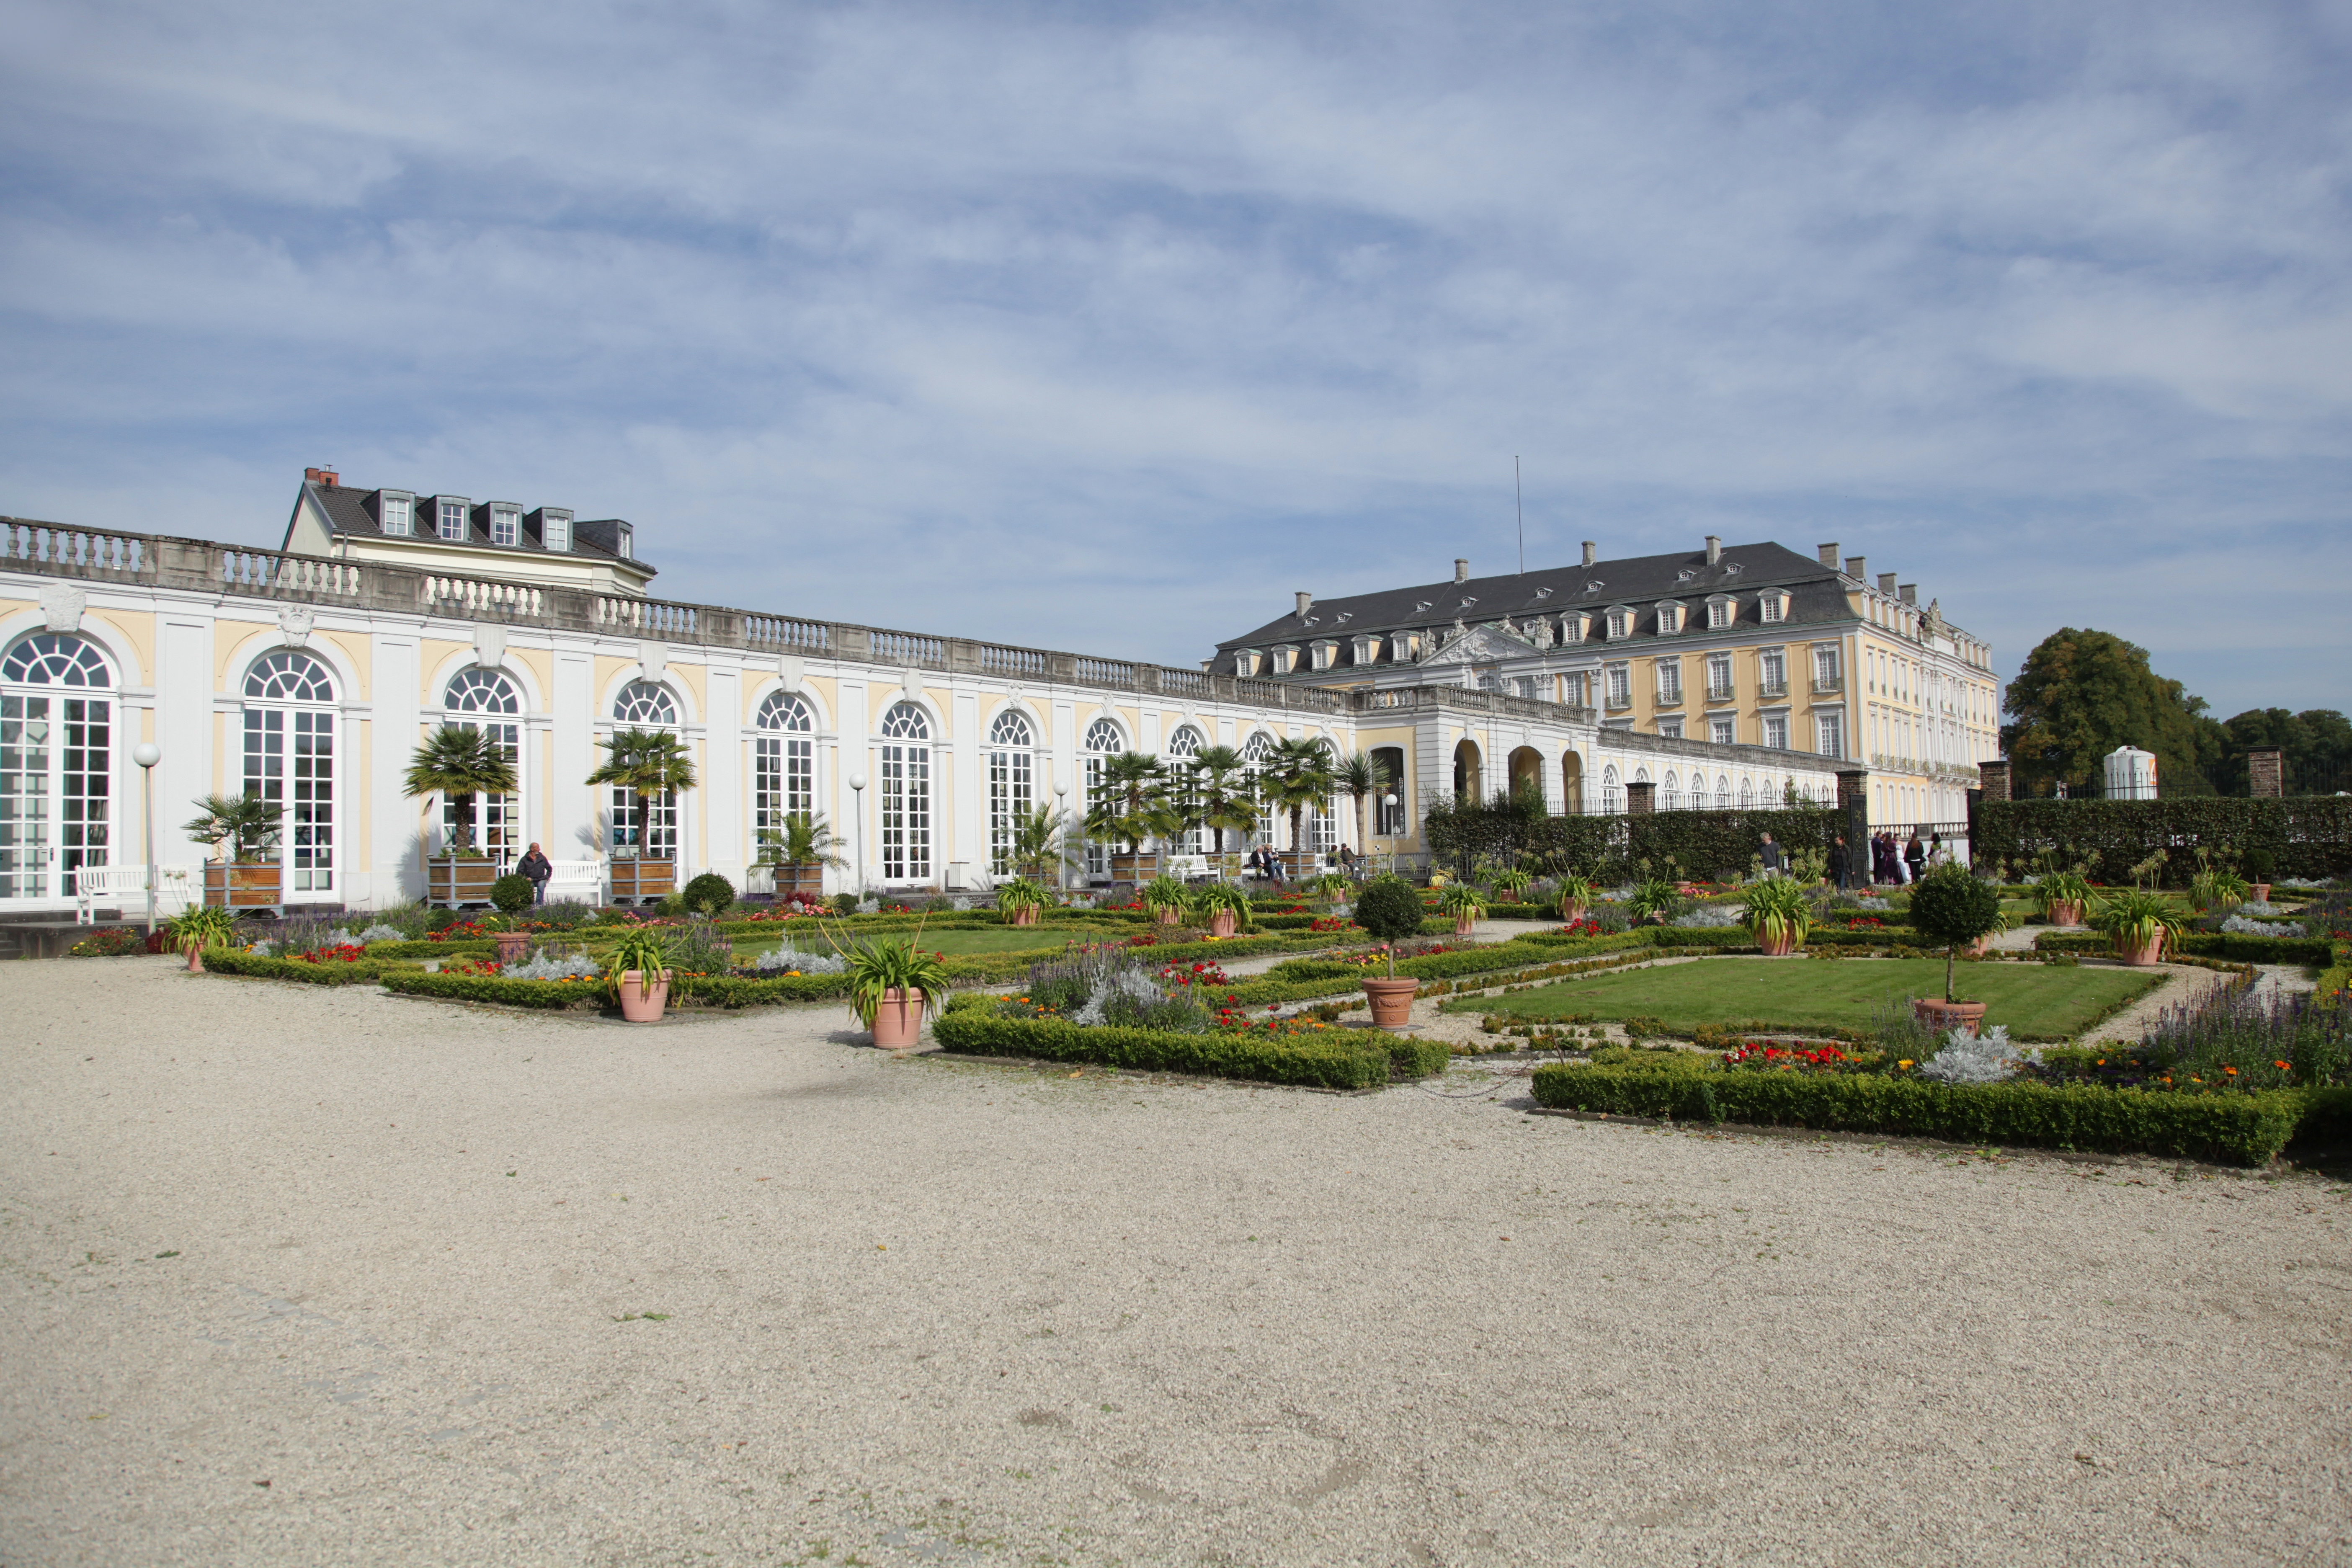 File Brühl Schloss Augustusburg Schlosspark Jardin Secret